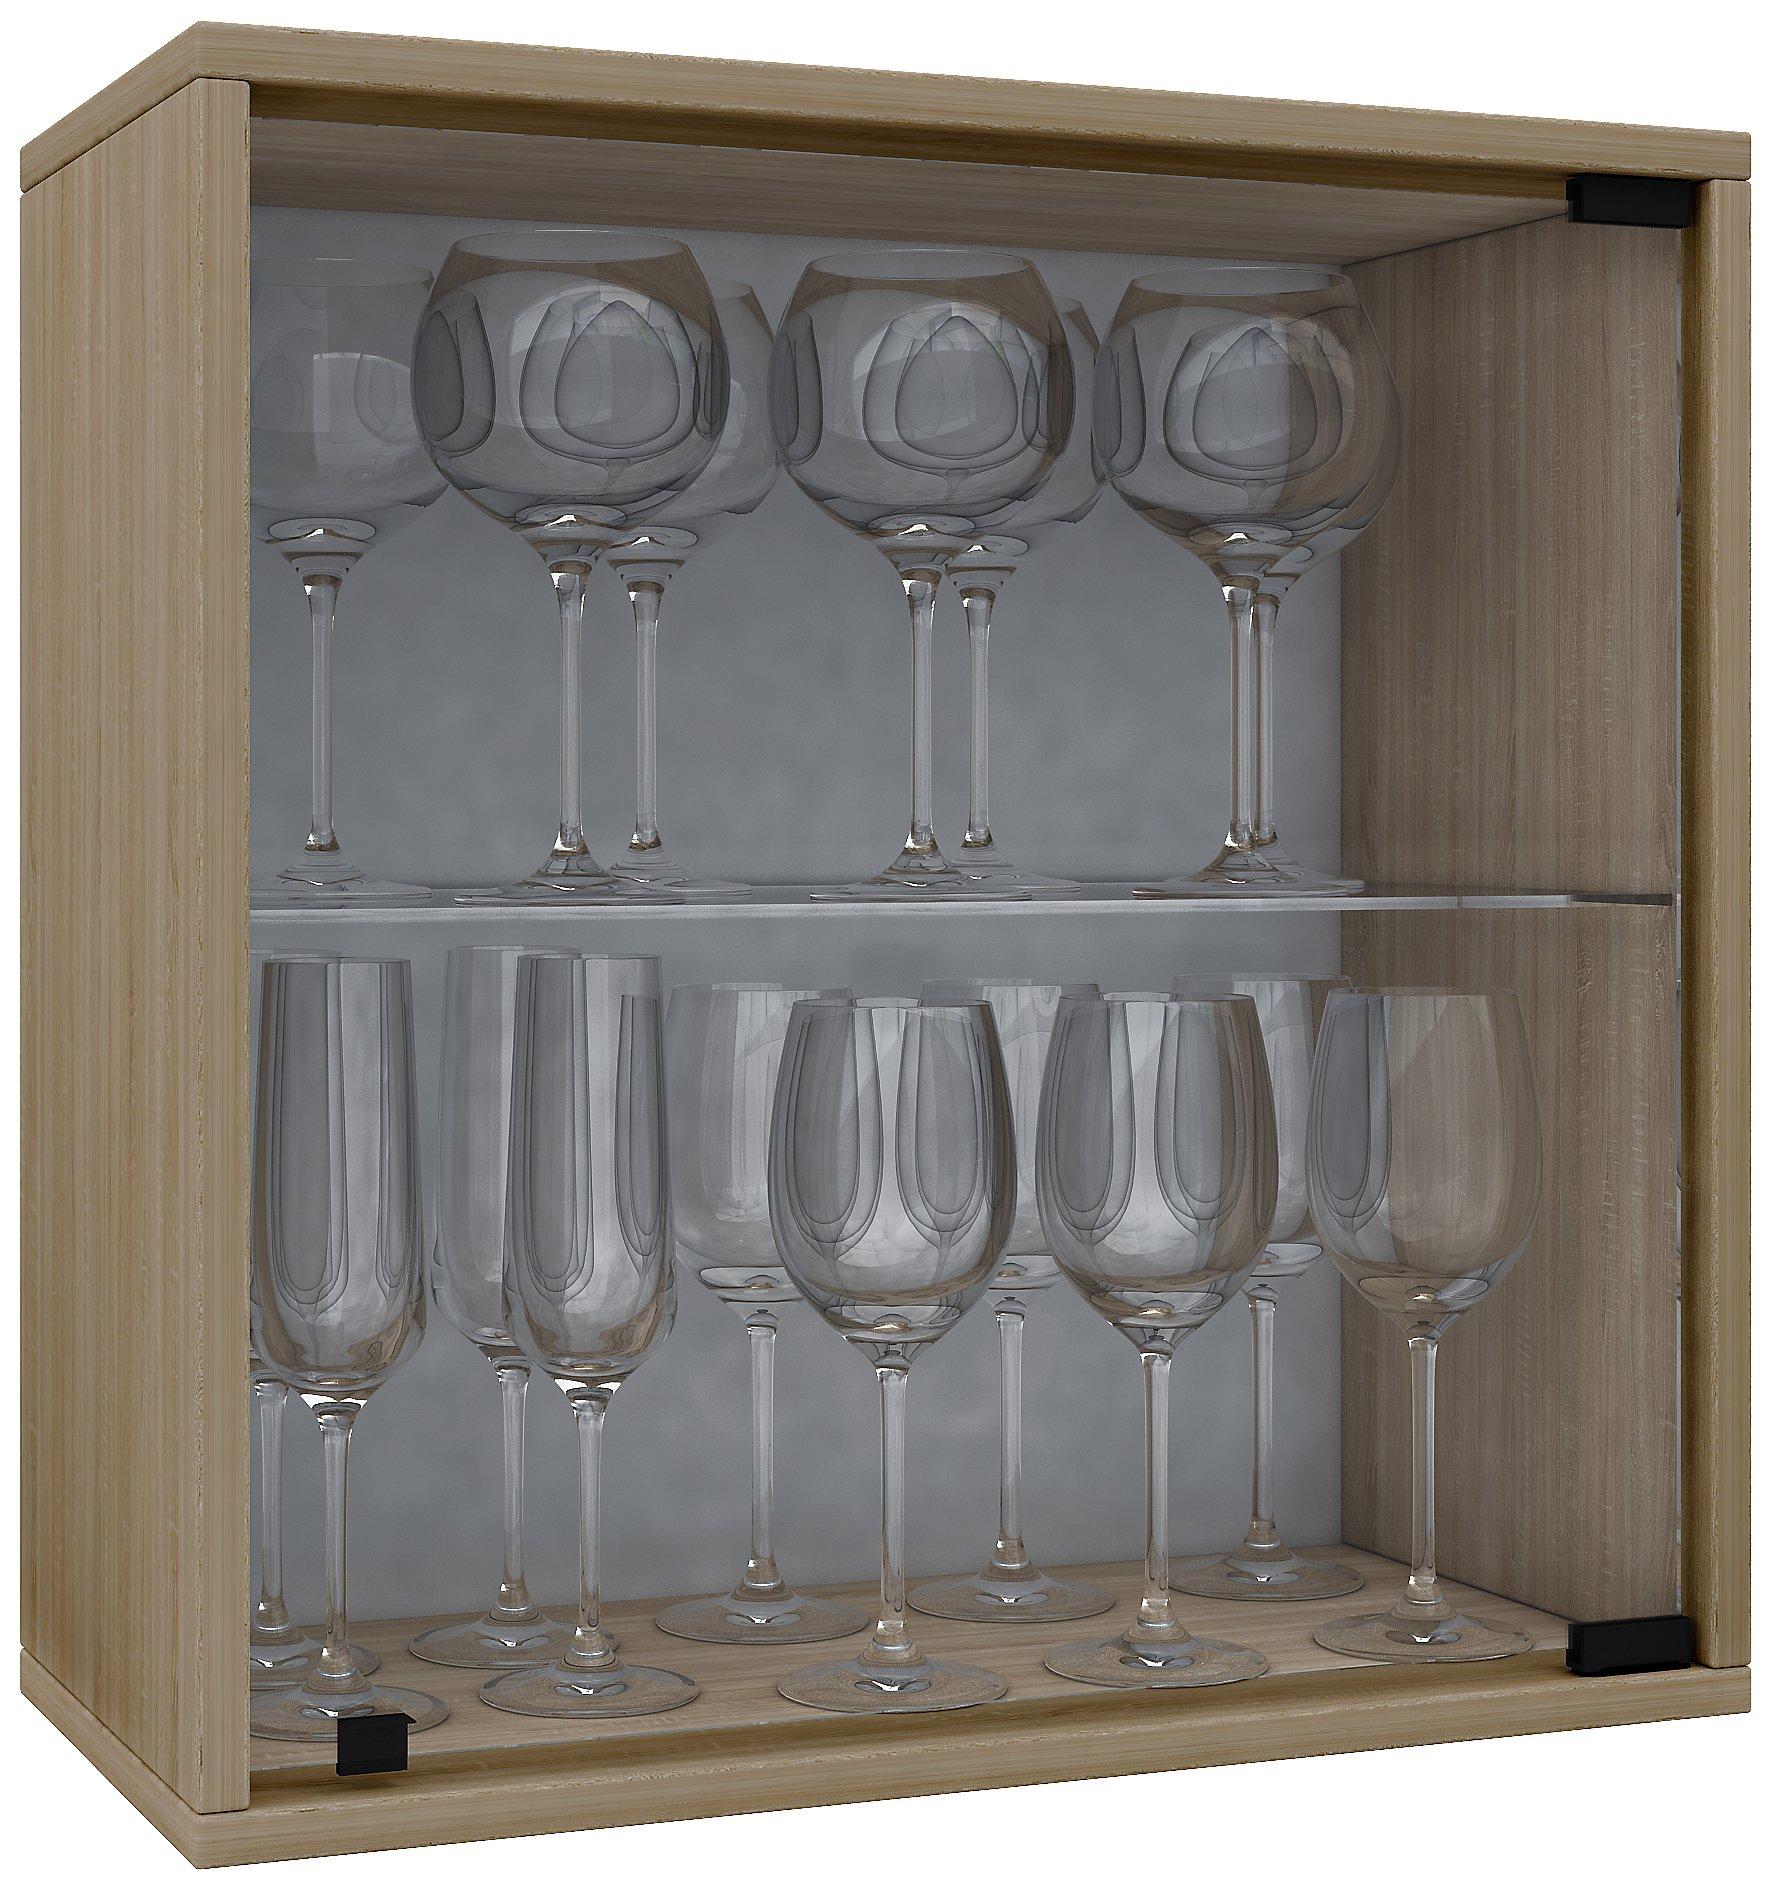 Vcm Wein Regalserie Regal Weinregal Weinschrank Weinflaschen